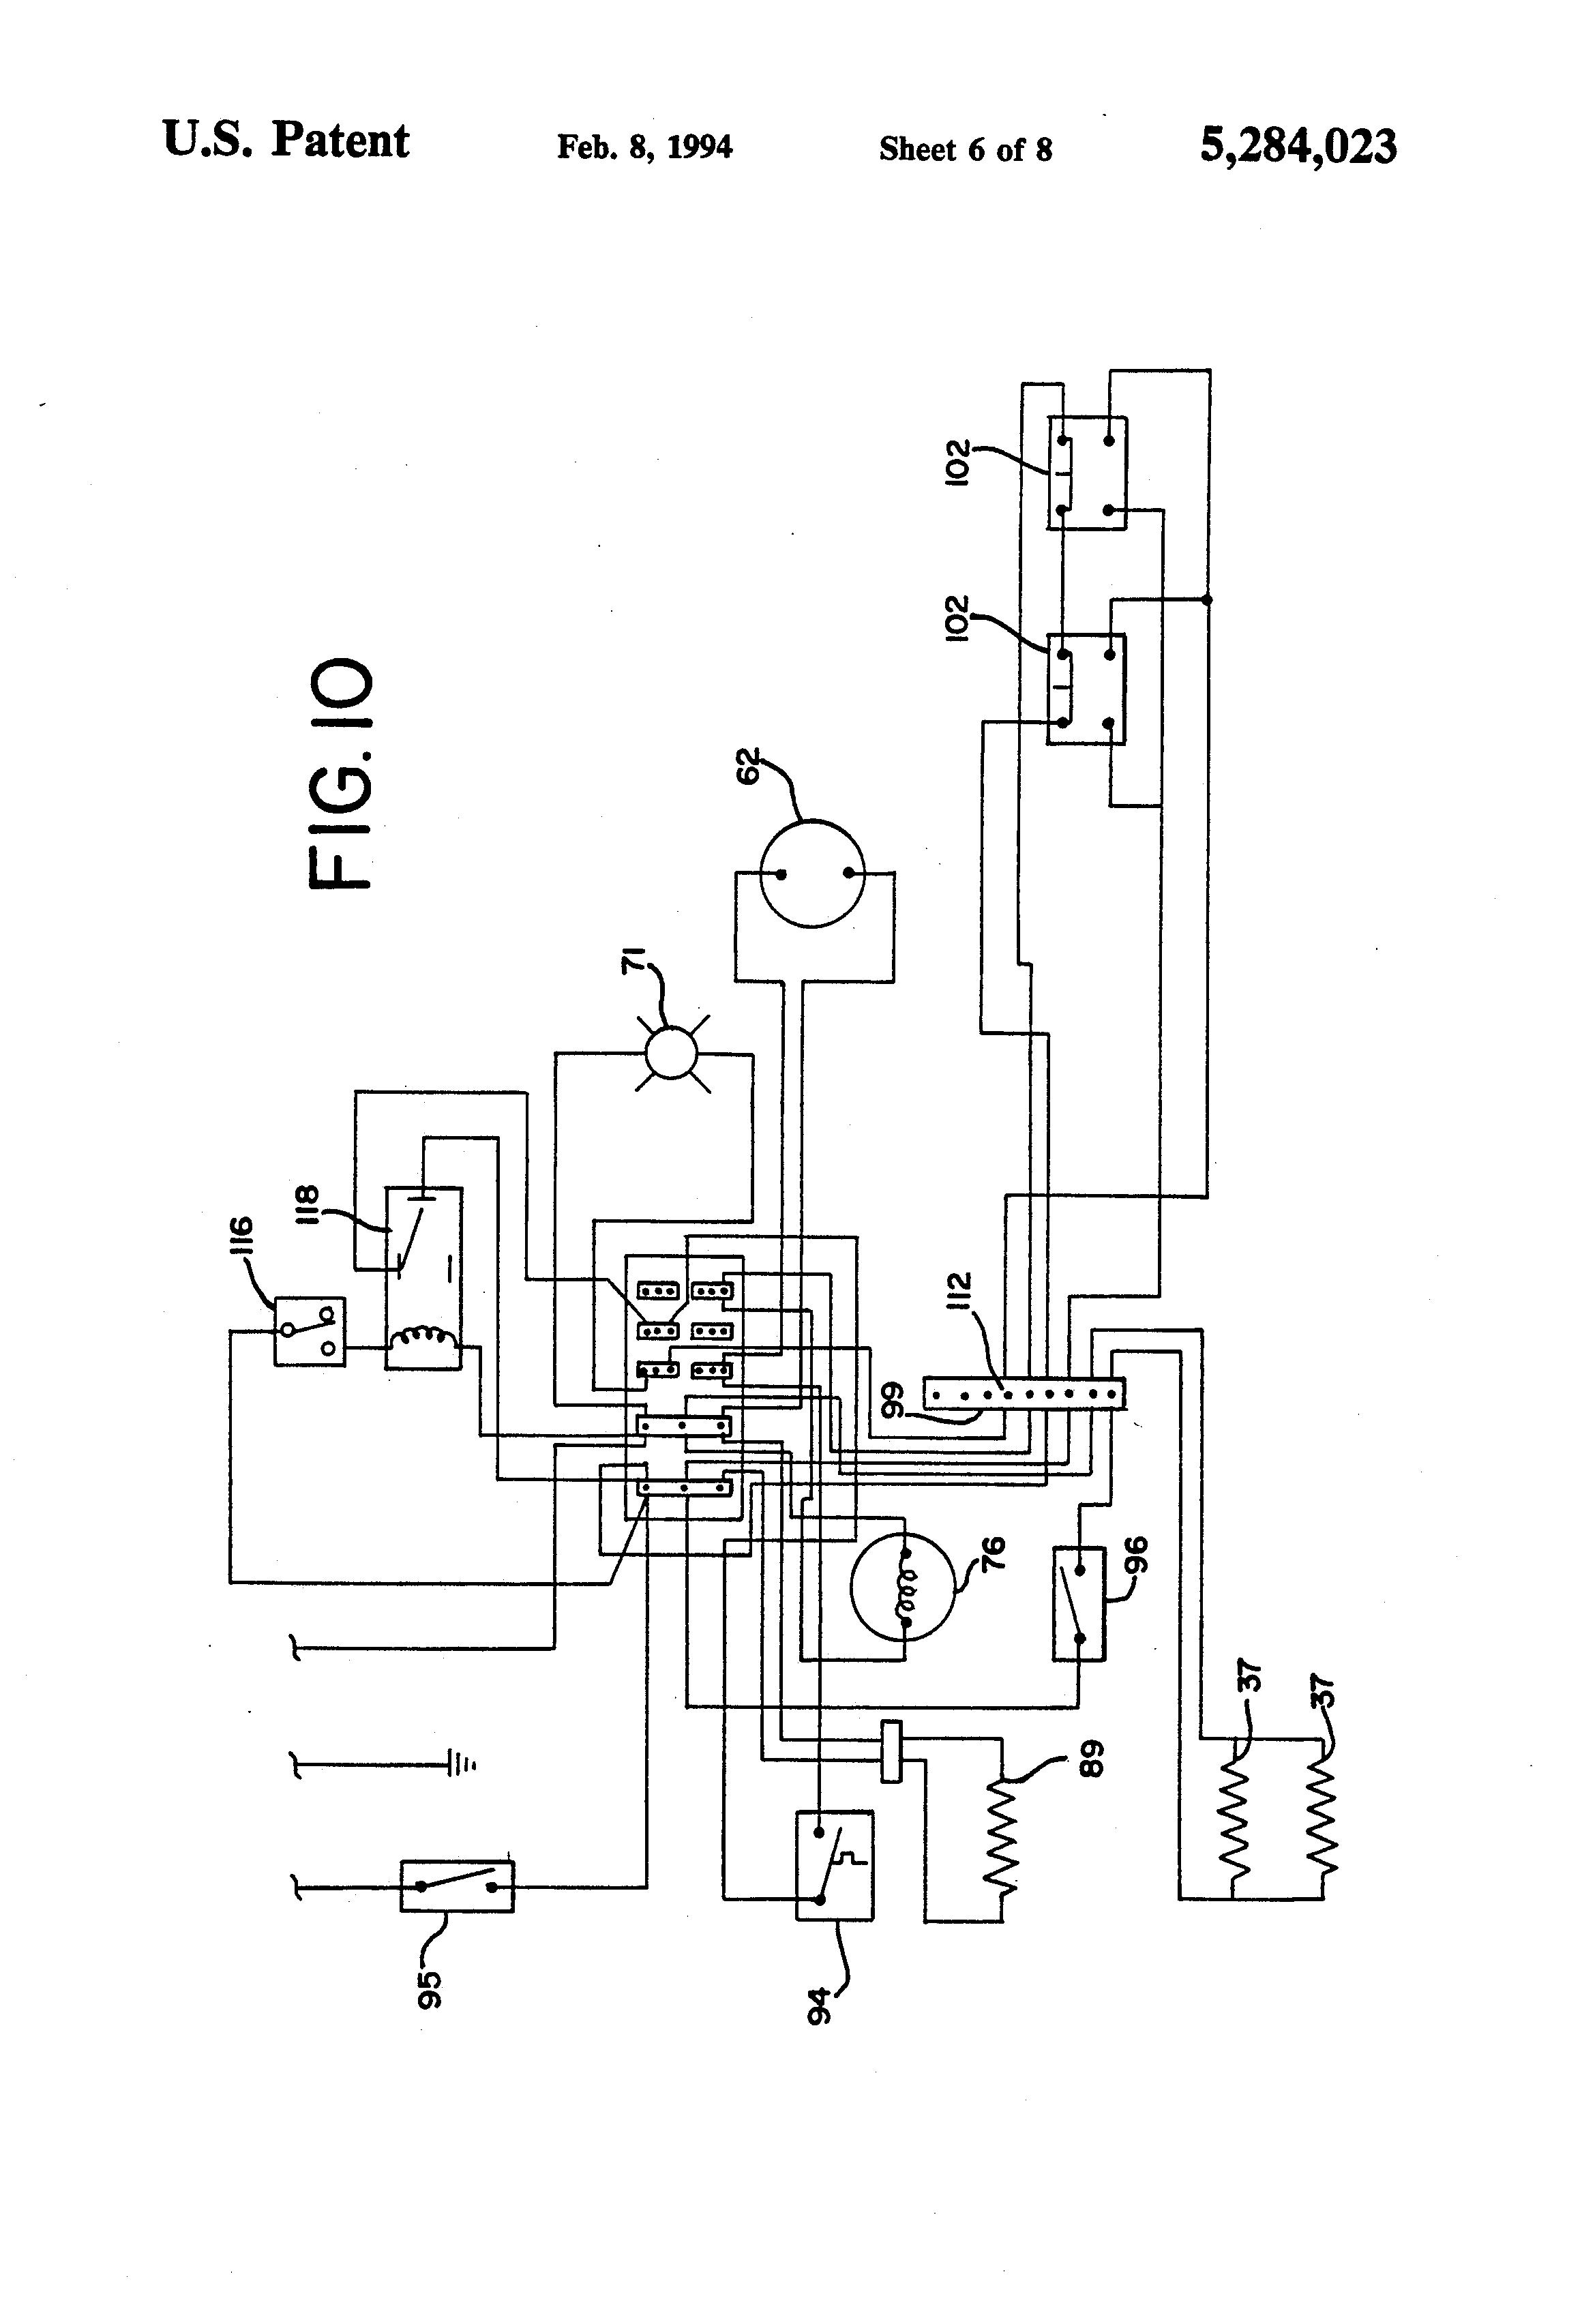 Precision Refrigeration Defrost Control 6141-0 Wiring Diagram